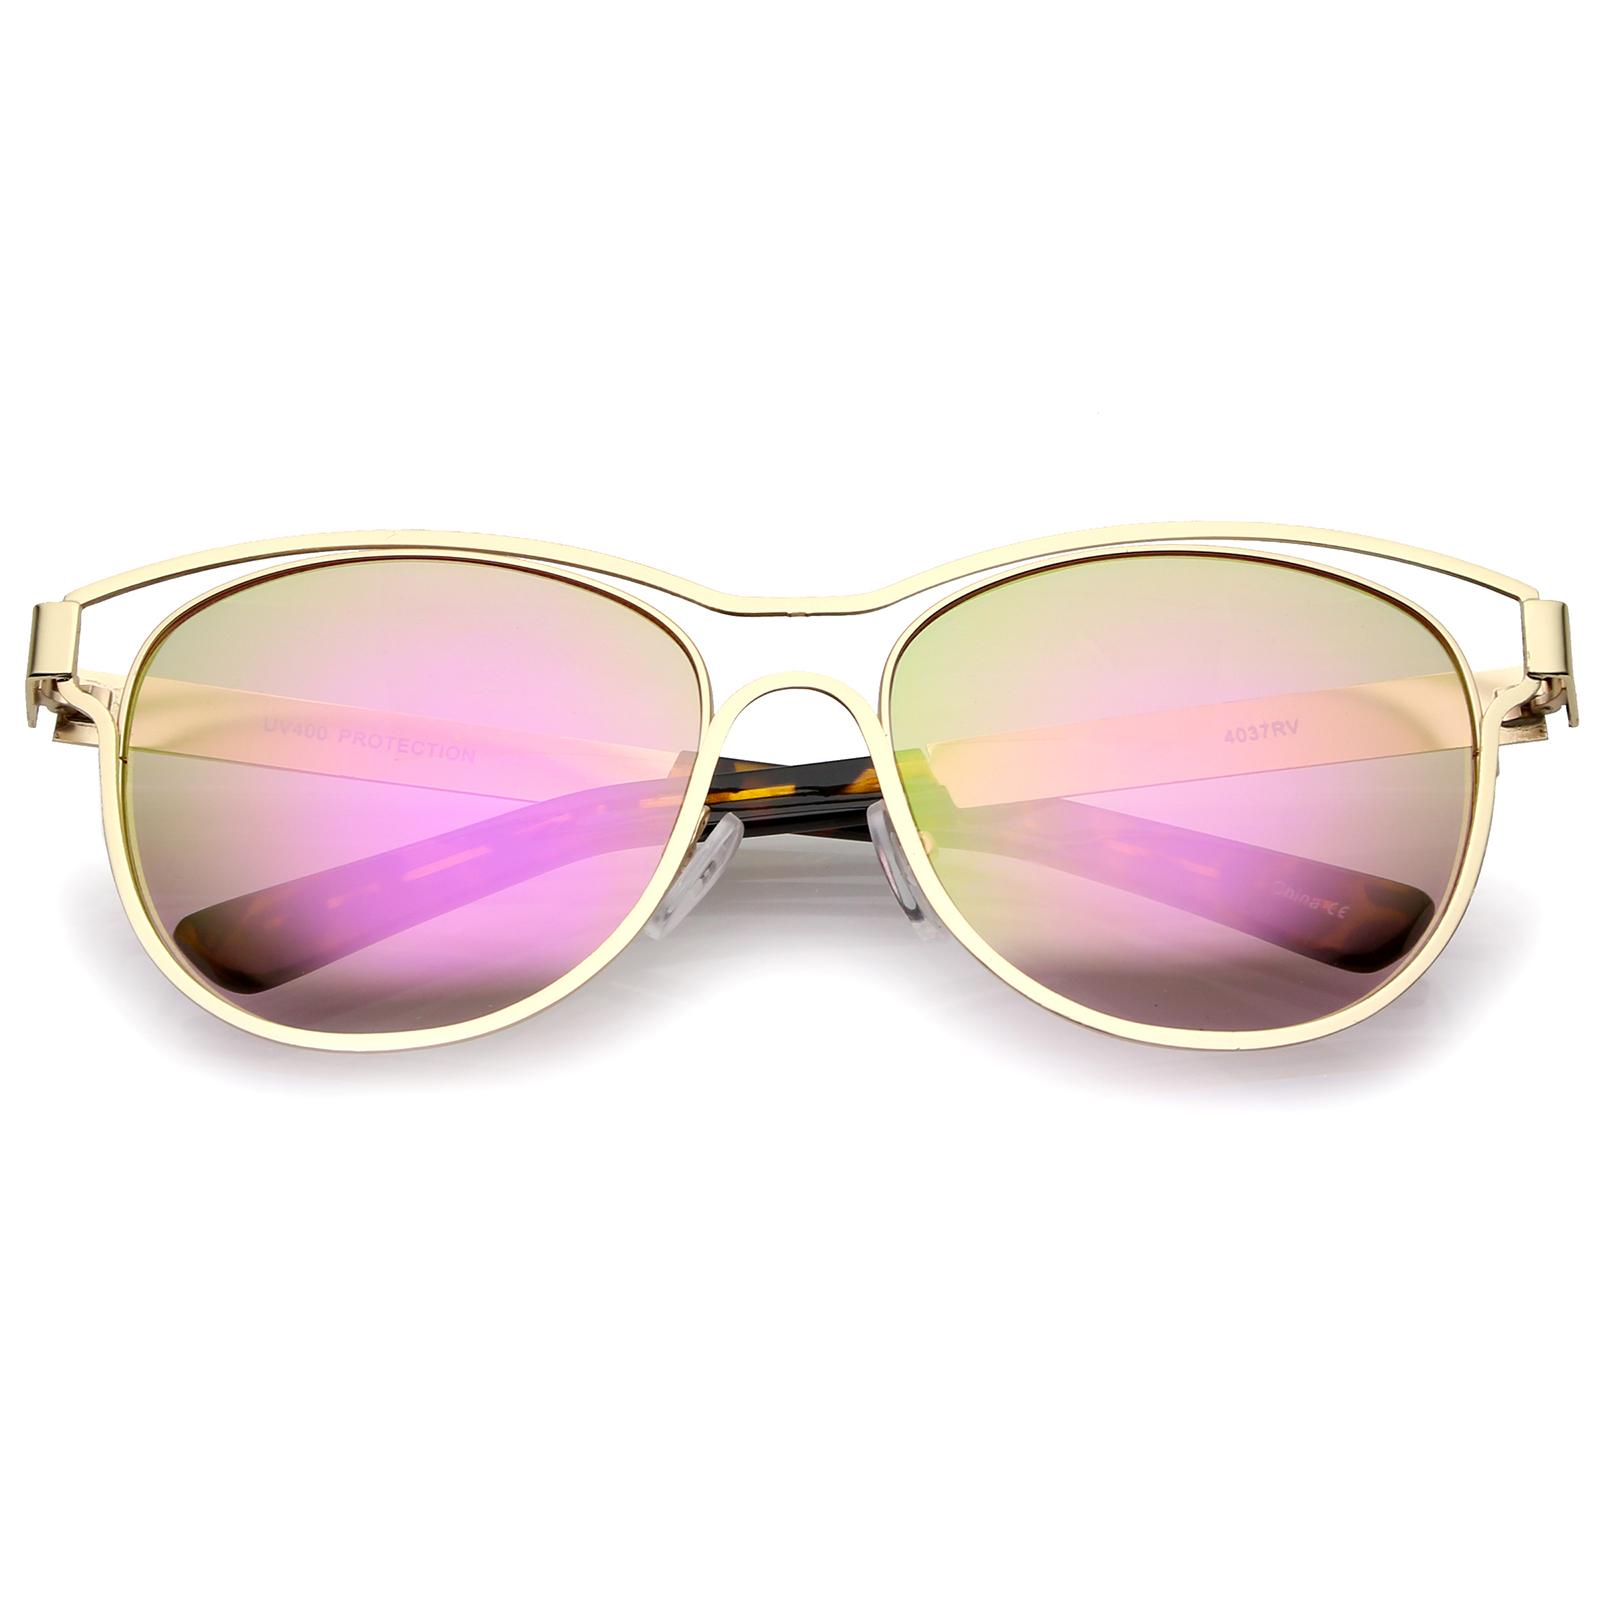 b78d5445d7 Celebrity Trend Alert  Rainbow-Bright Mirrored Sunglasses